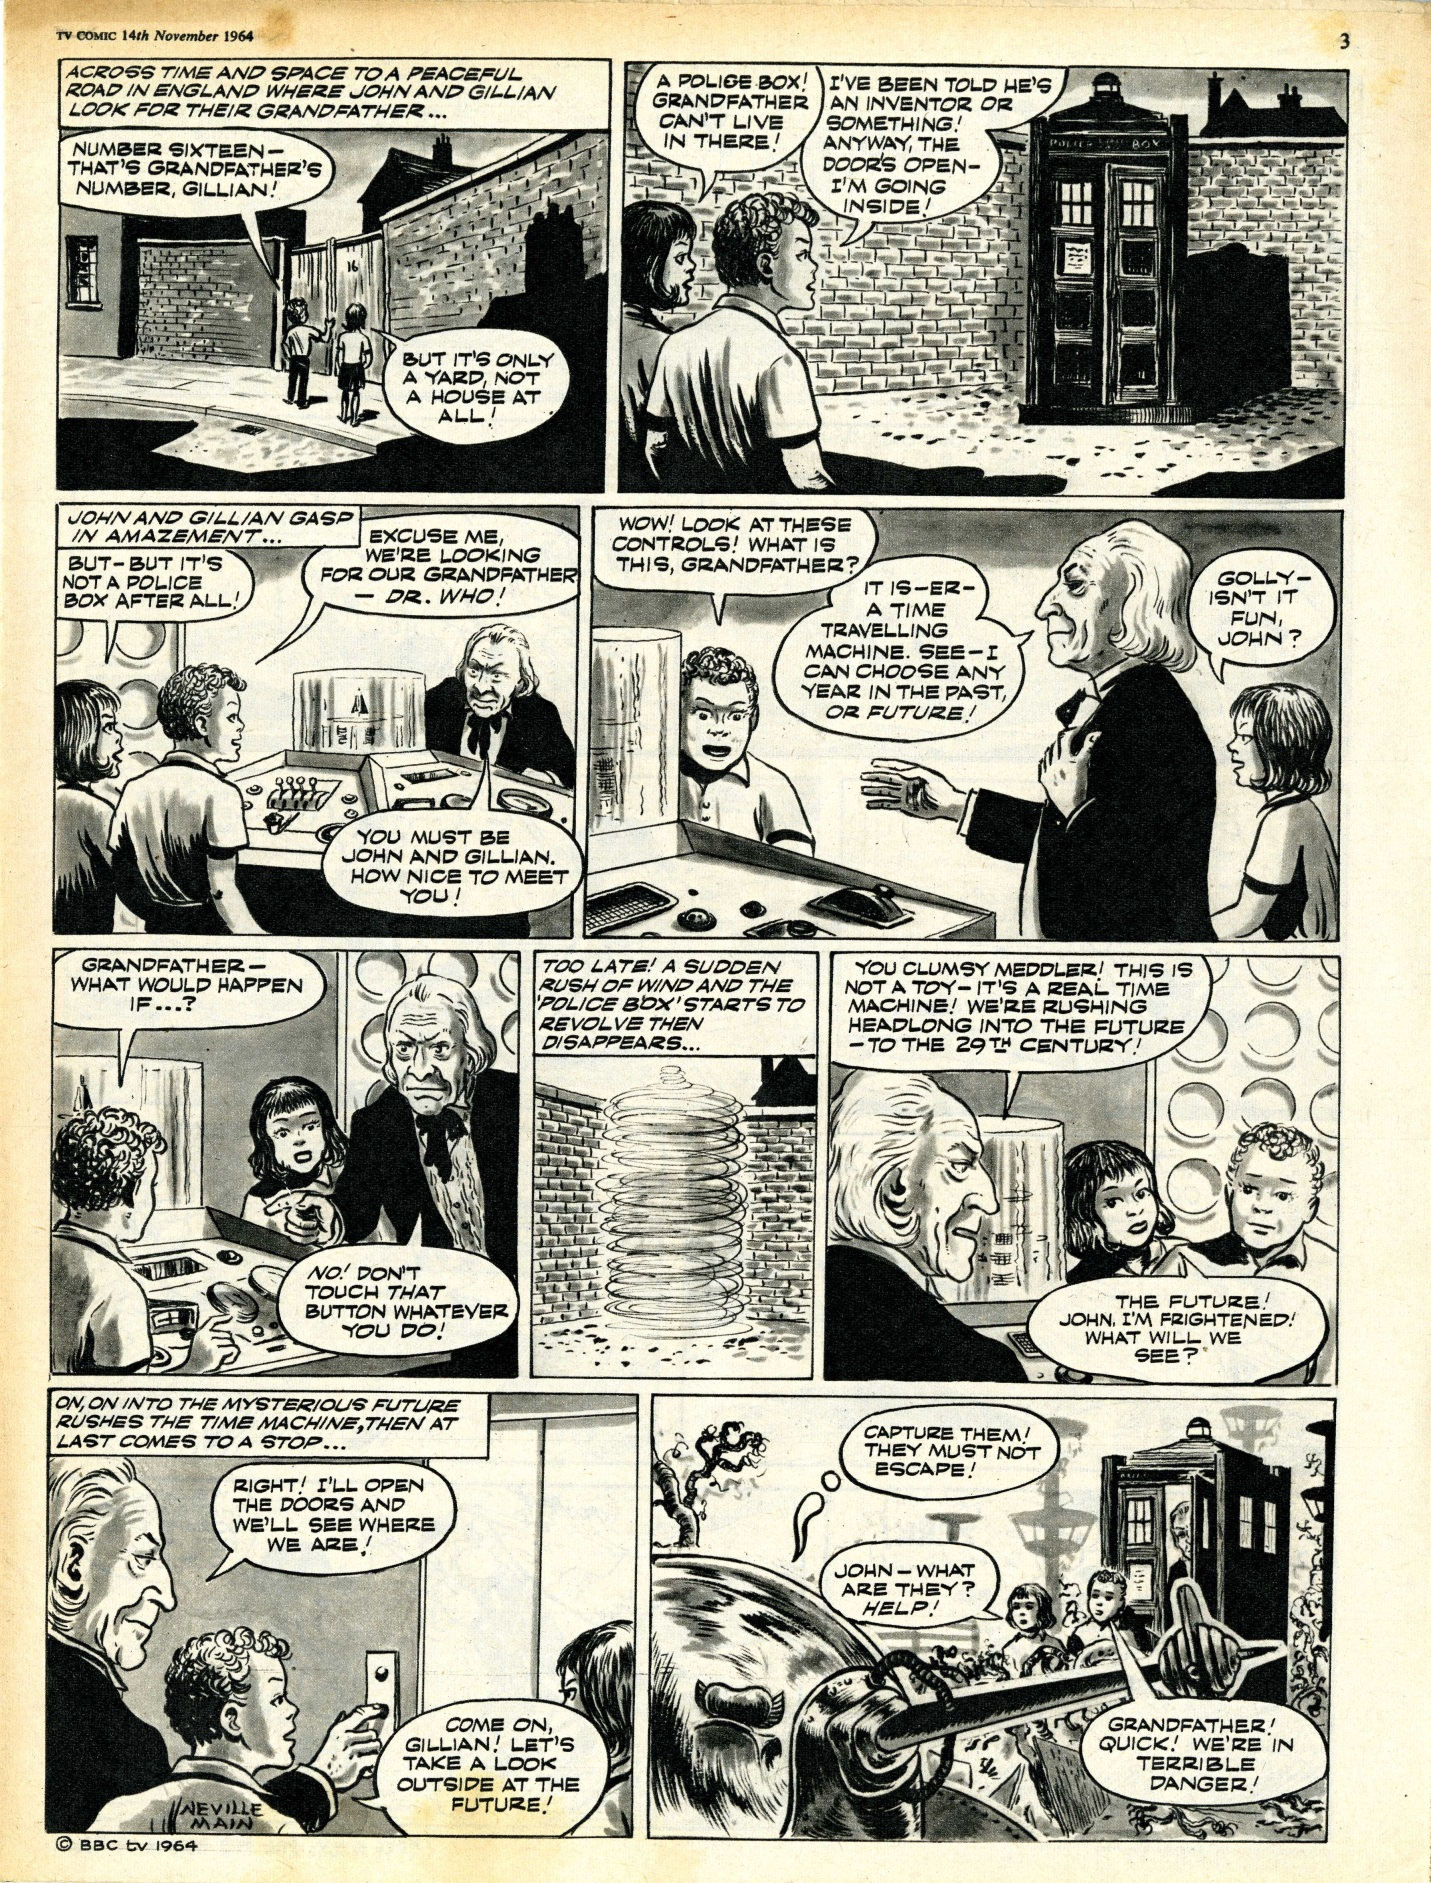 TV Comic No. 674, 14 November 1964, page 2 of The Klepton Parasites